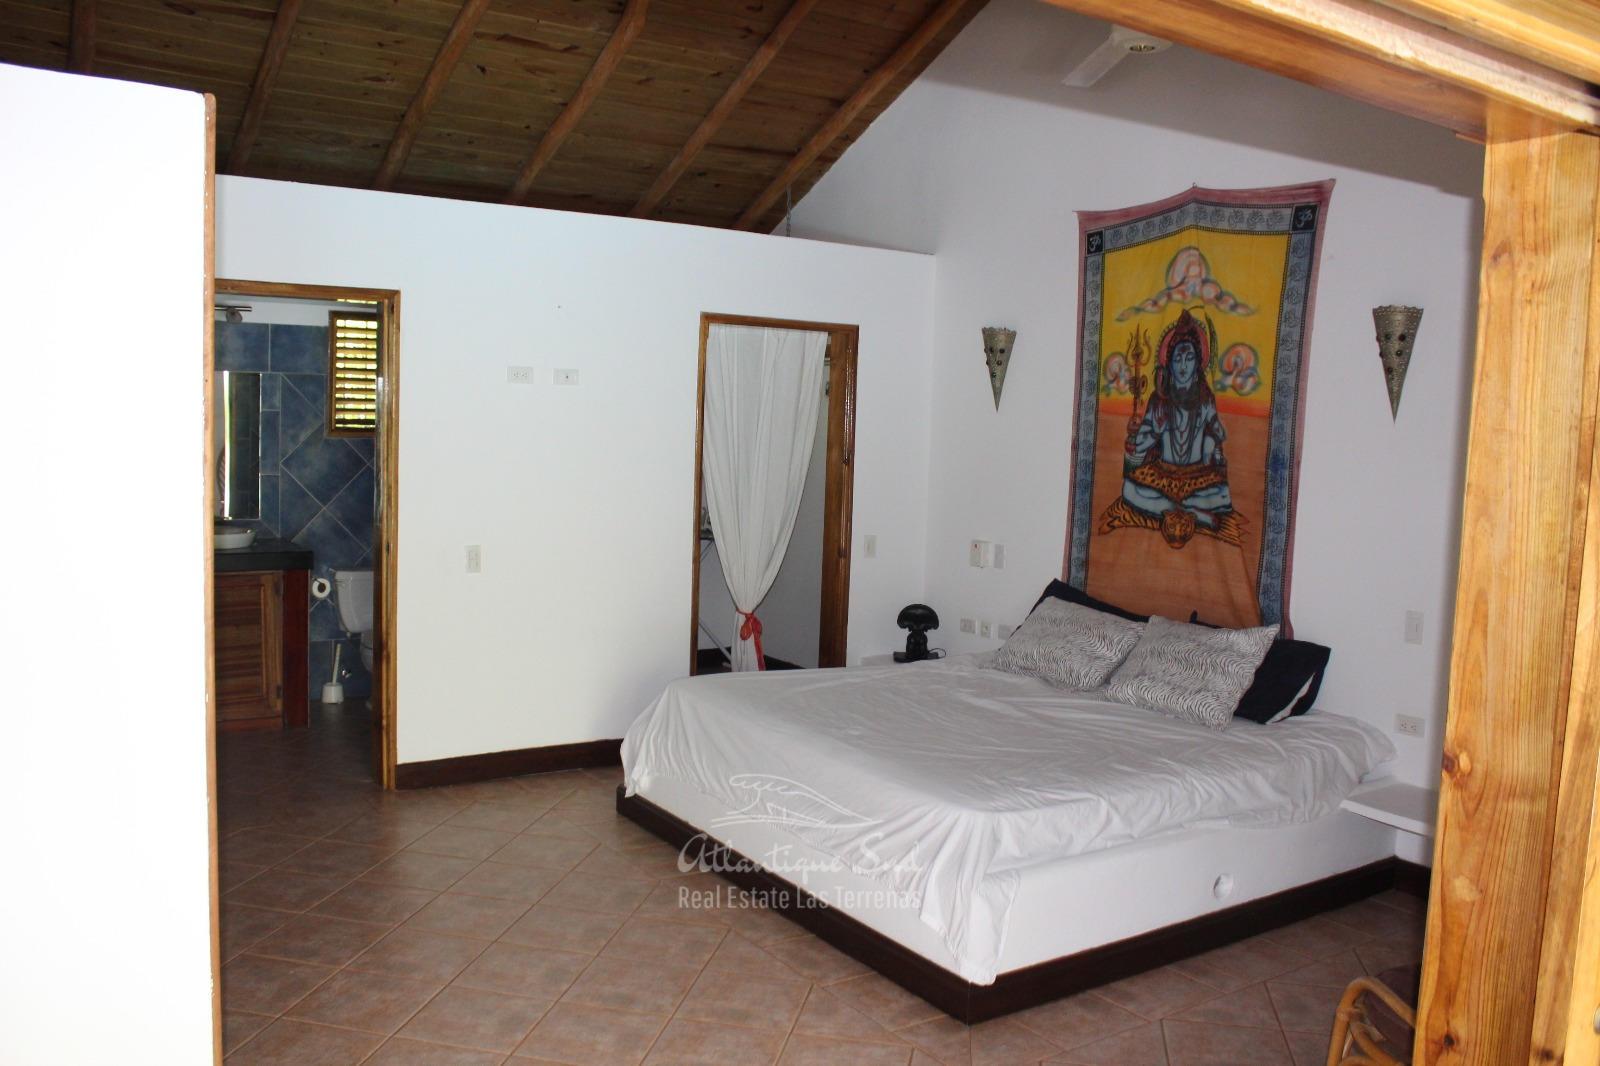 Villa Authentic Carribean Real Estate Las Terrenas Dominican Republic29.jpg